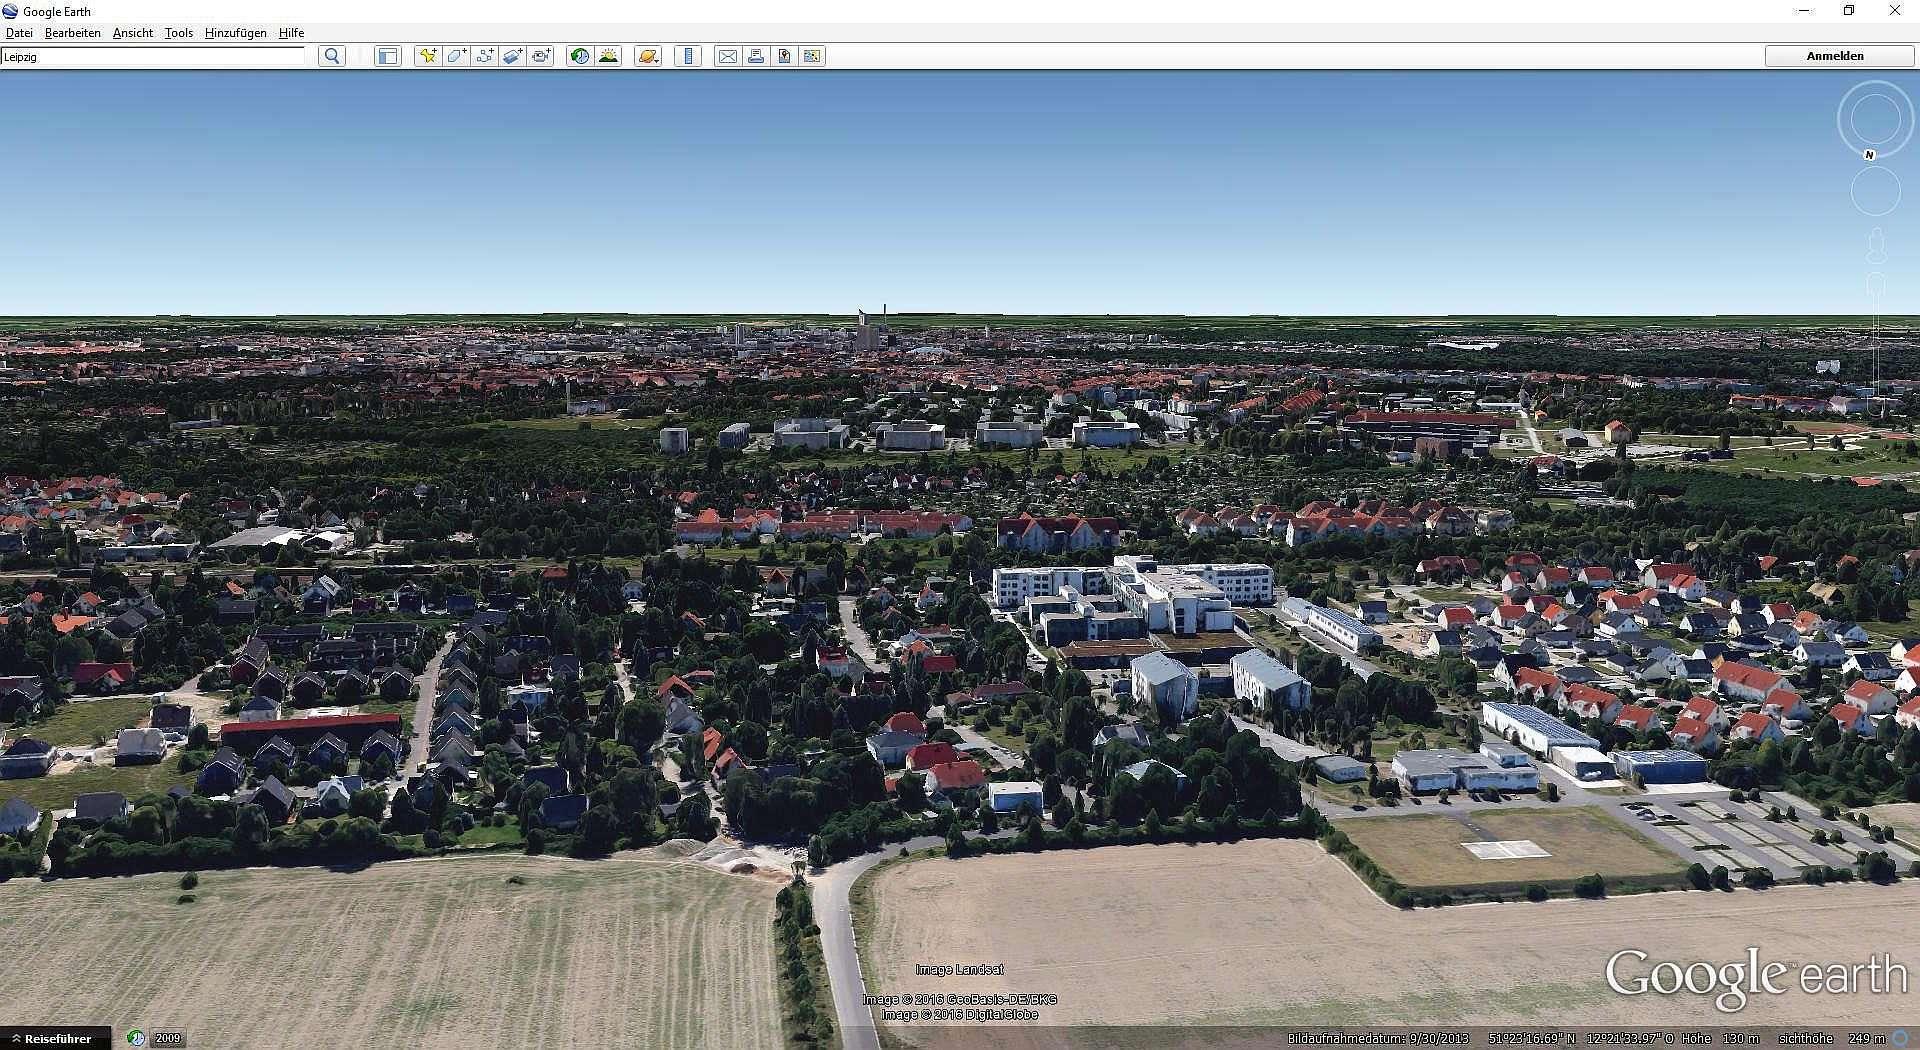 Luftbildpanorama Erstellen - Google Earth